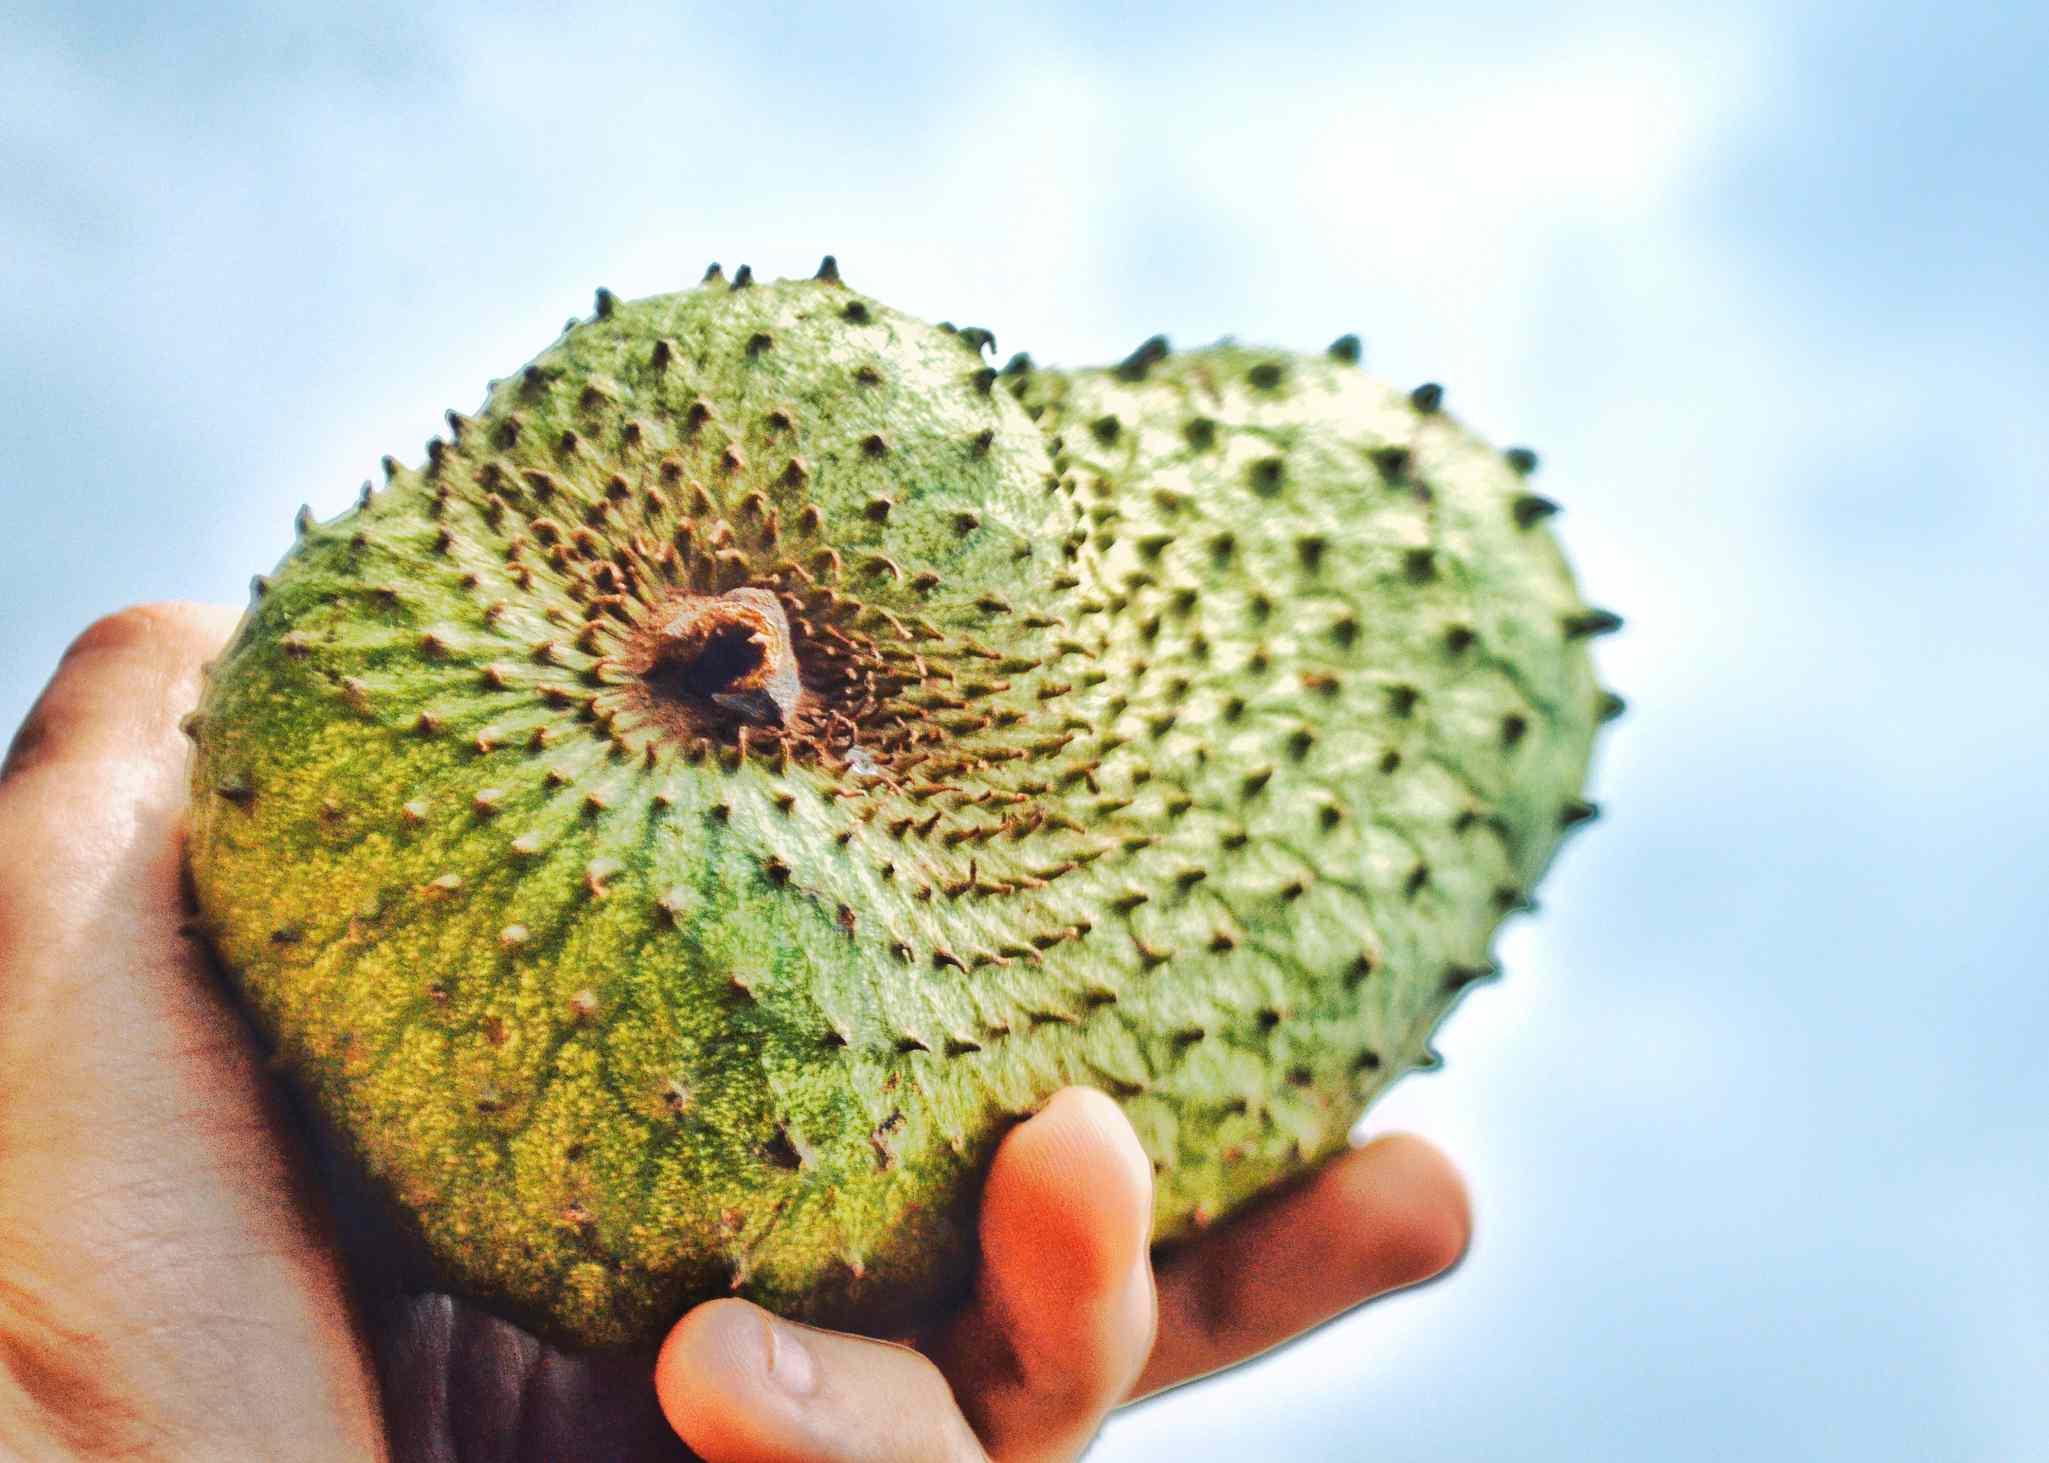 hand holding soursop fruit